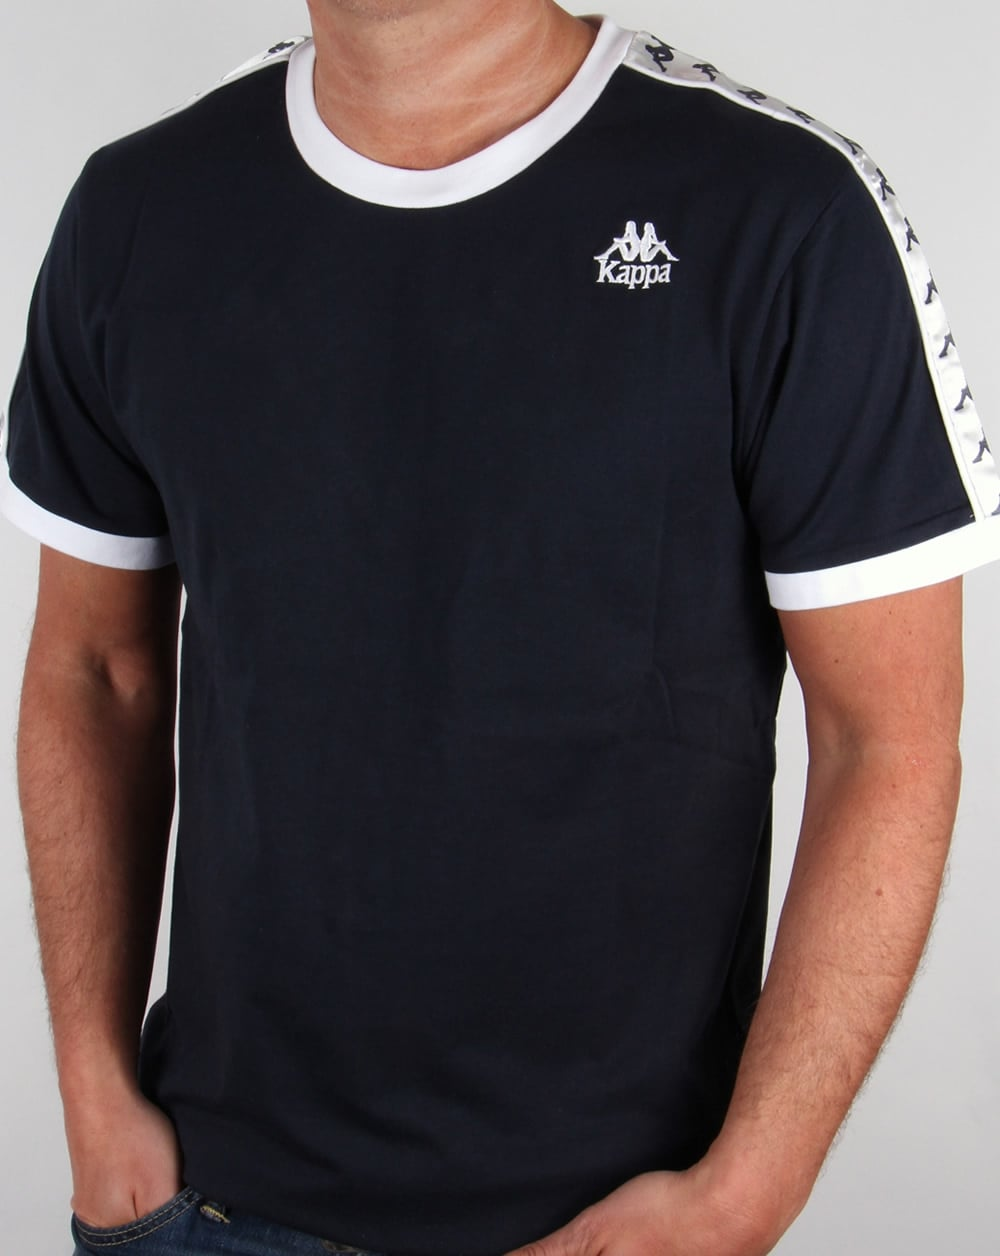 Robe Di Kappa Logo Ringer Taping T-shirt Navy,tee,retro,mens